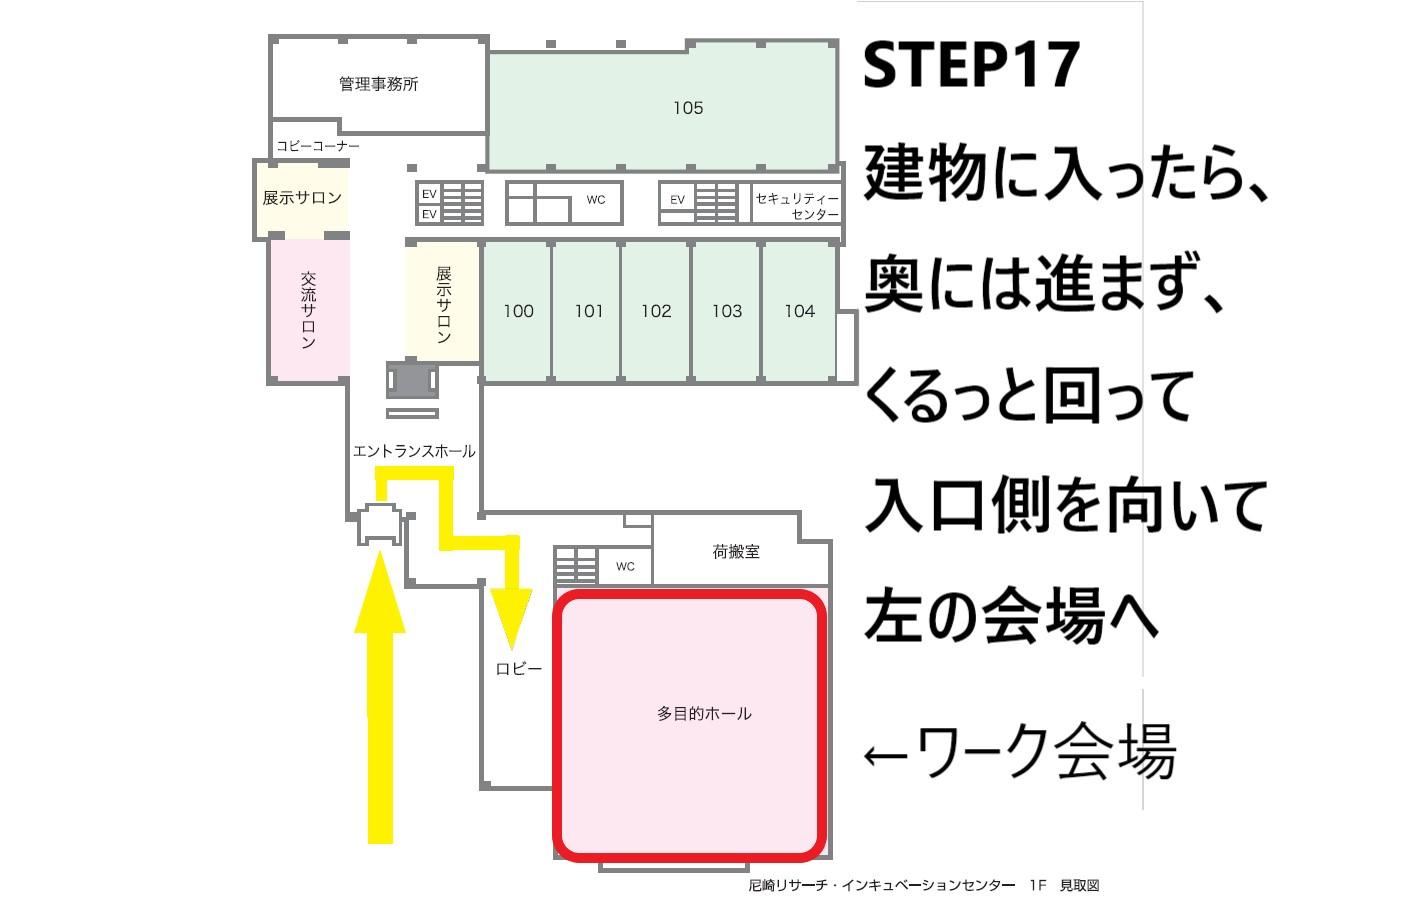 201808ama5_18.jpg